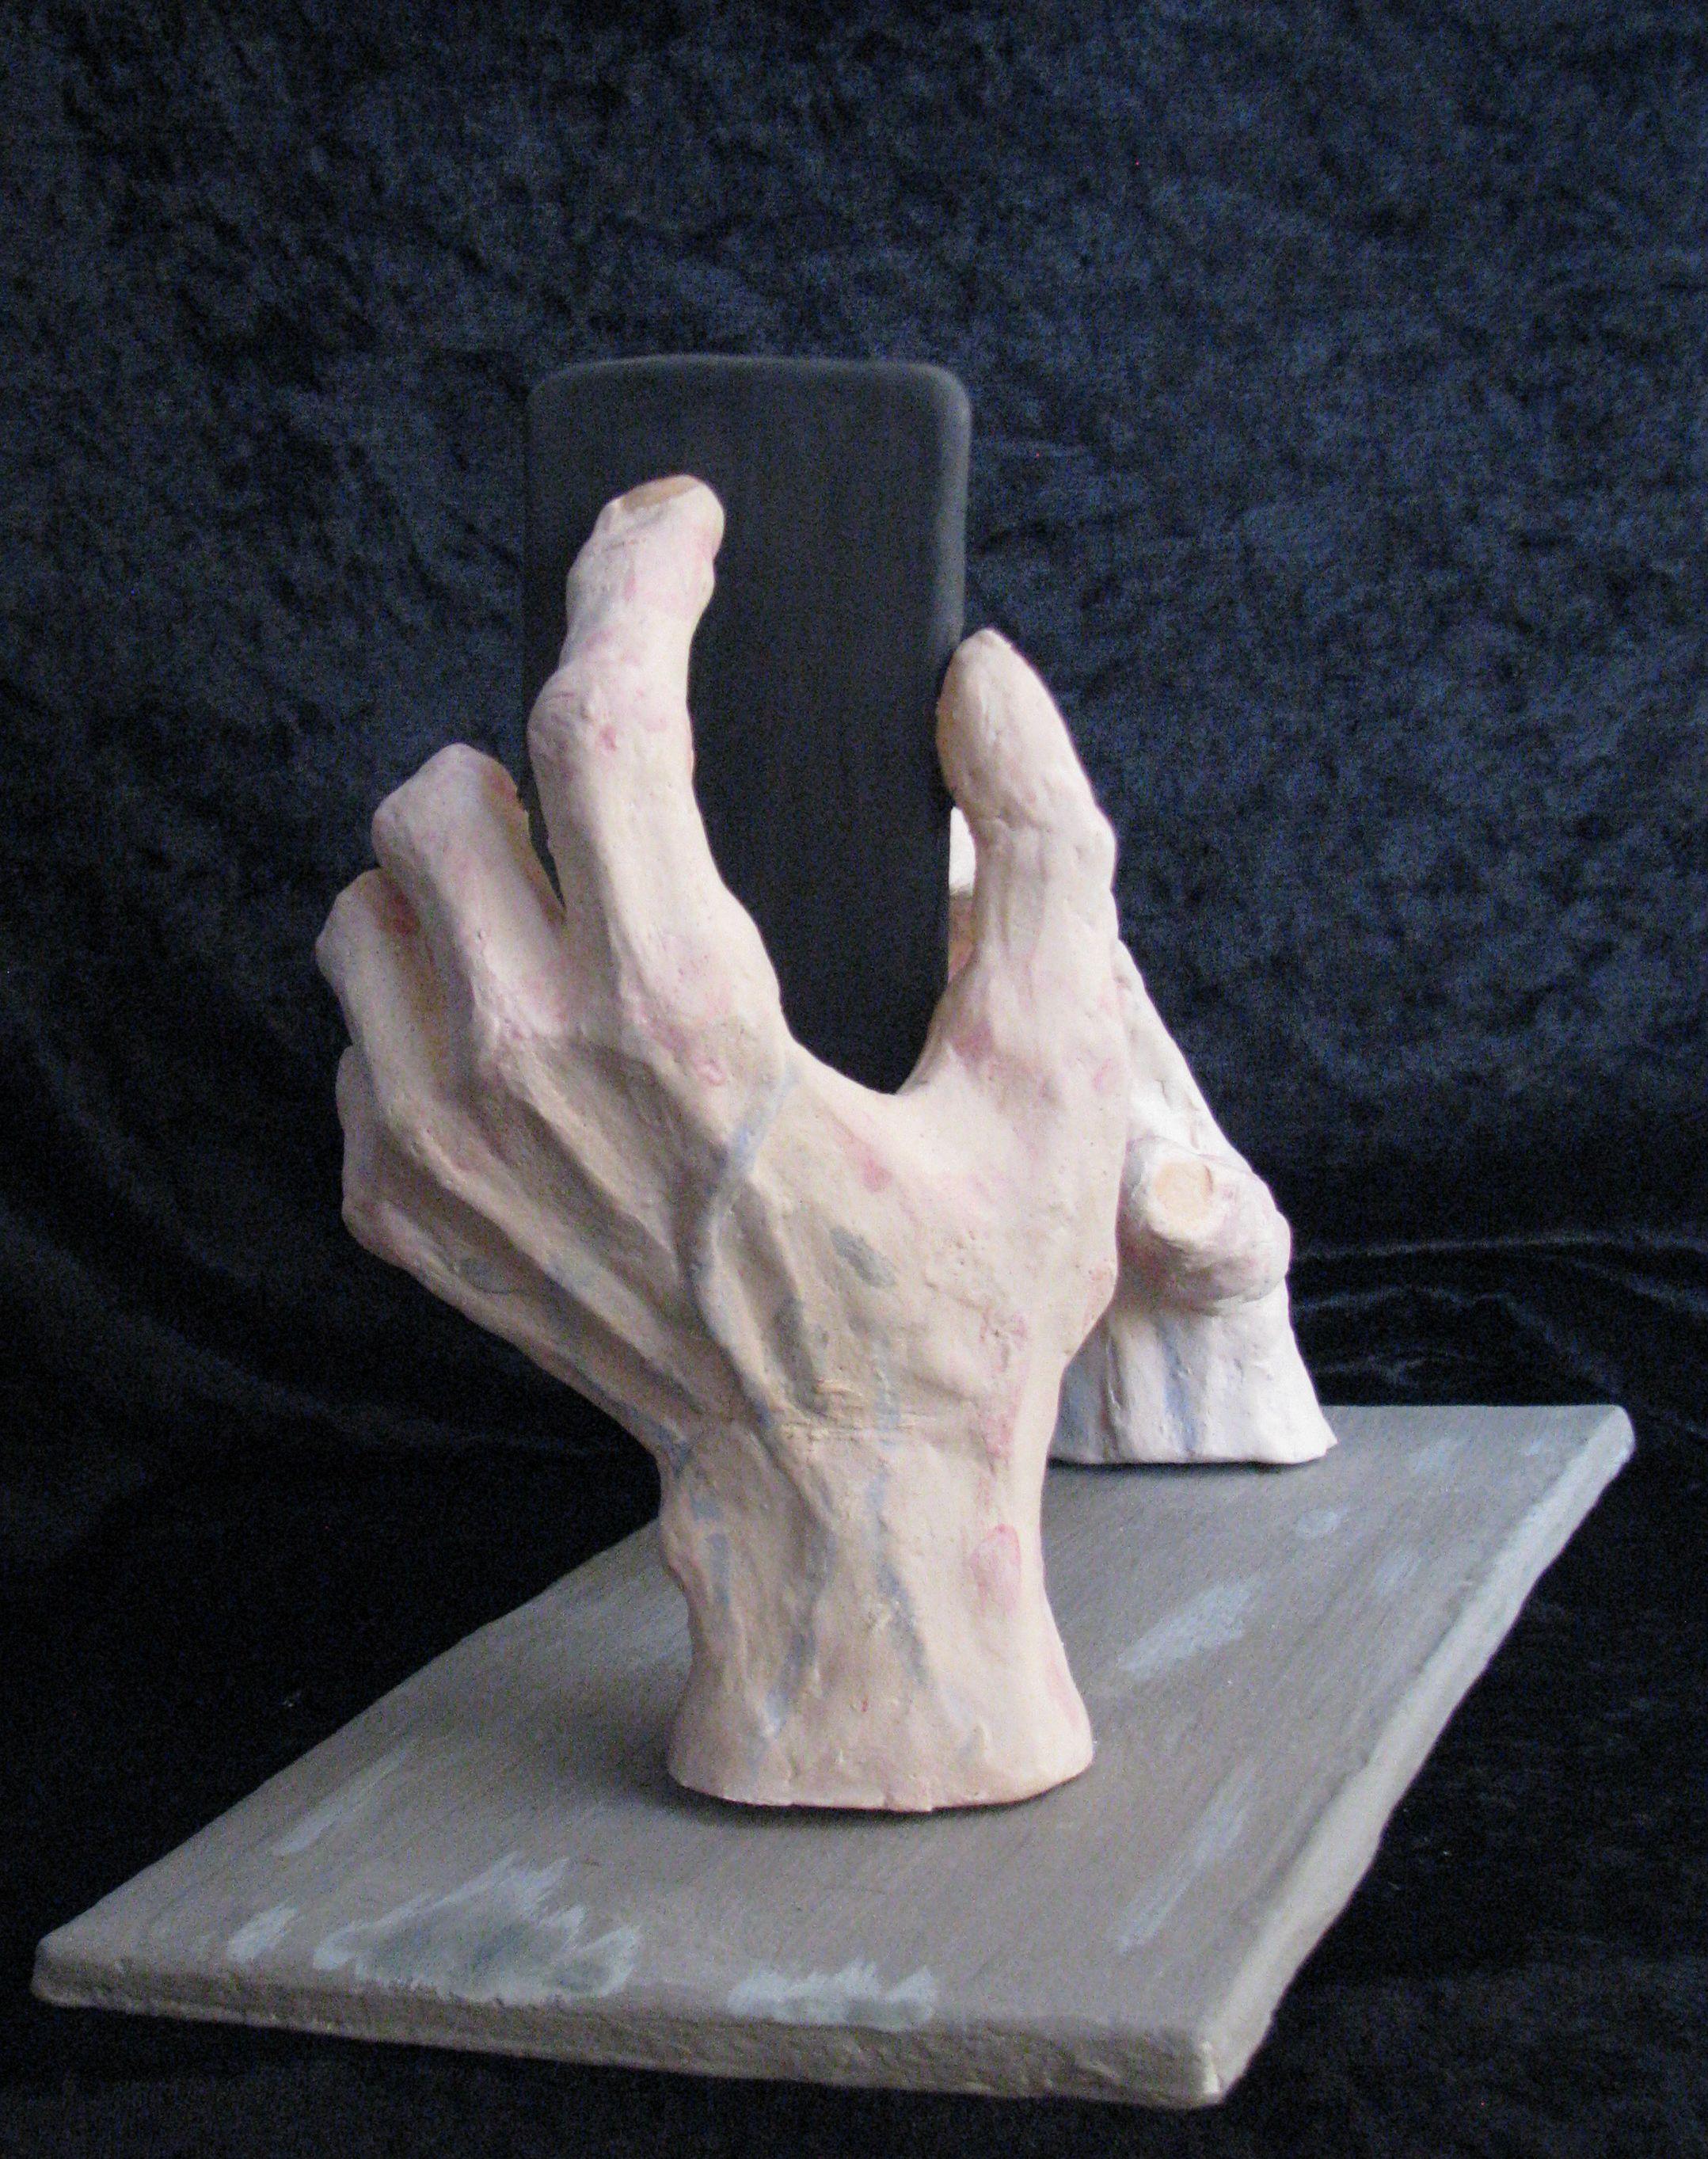 artrose handen 2 (2)